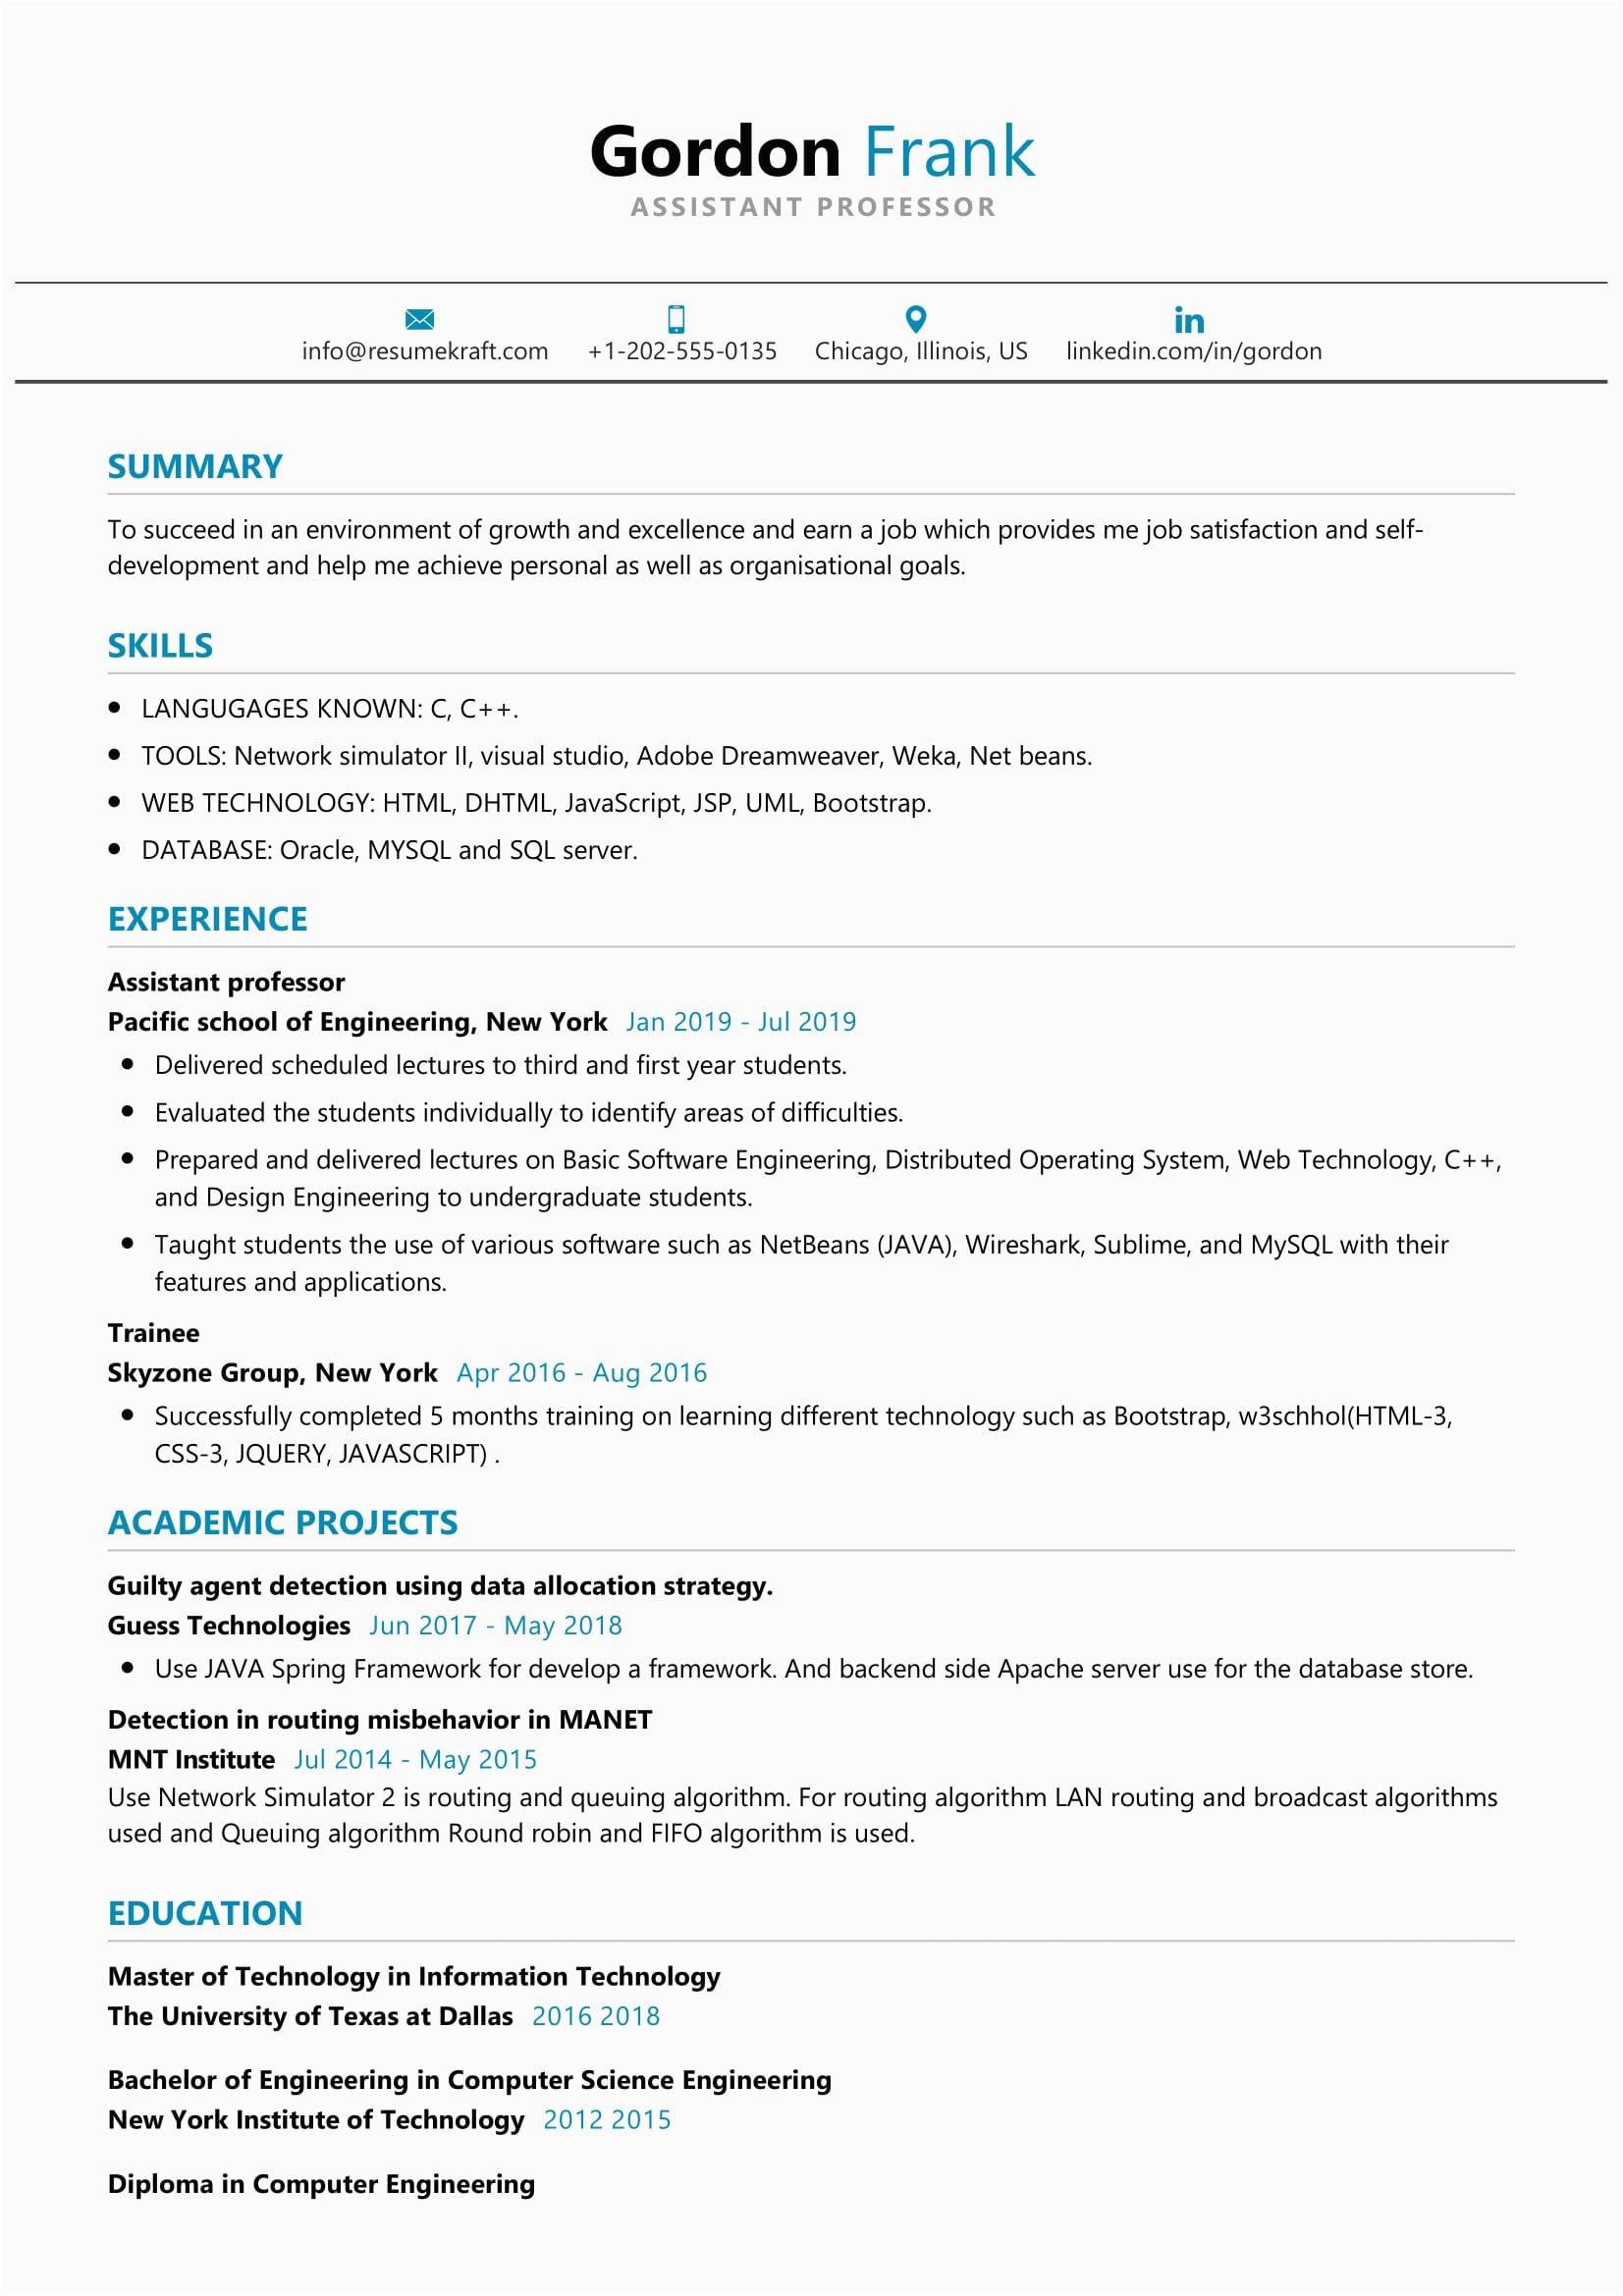 Sample Resume for Experienced assistant Professor In Engineering College assistant Professor Resume Sample Resumekraft